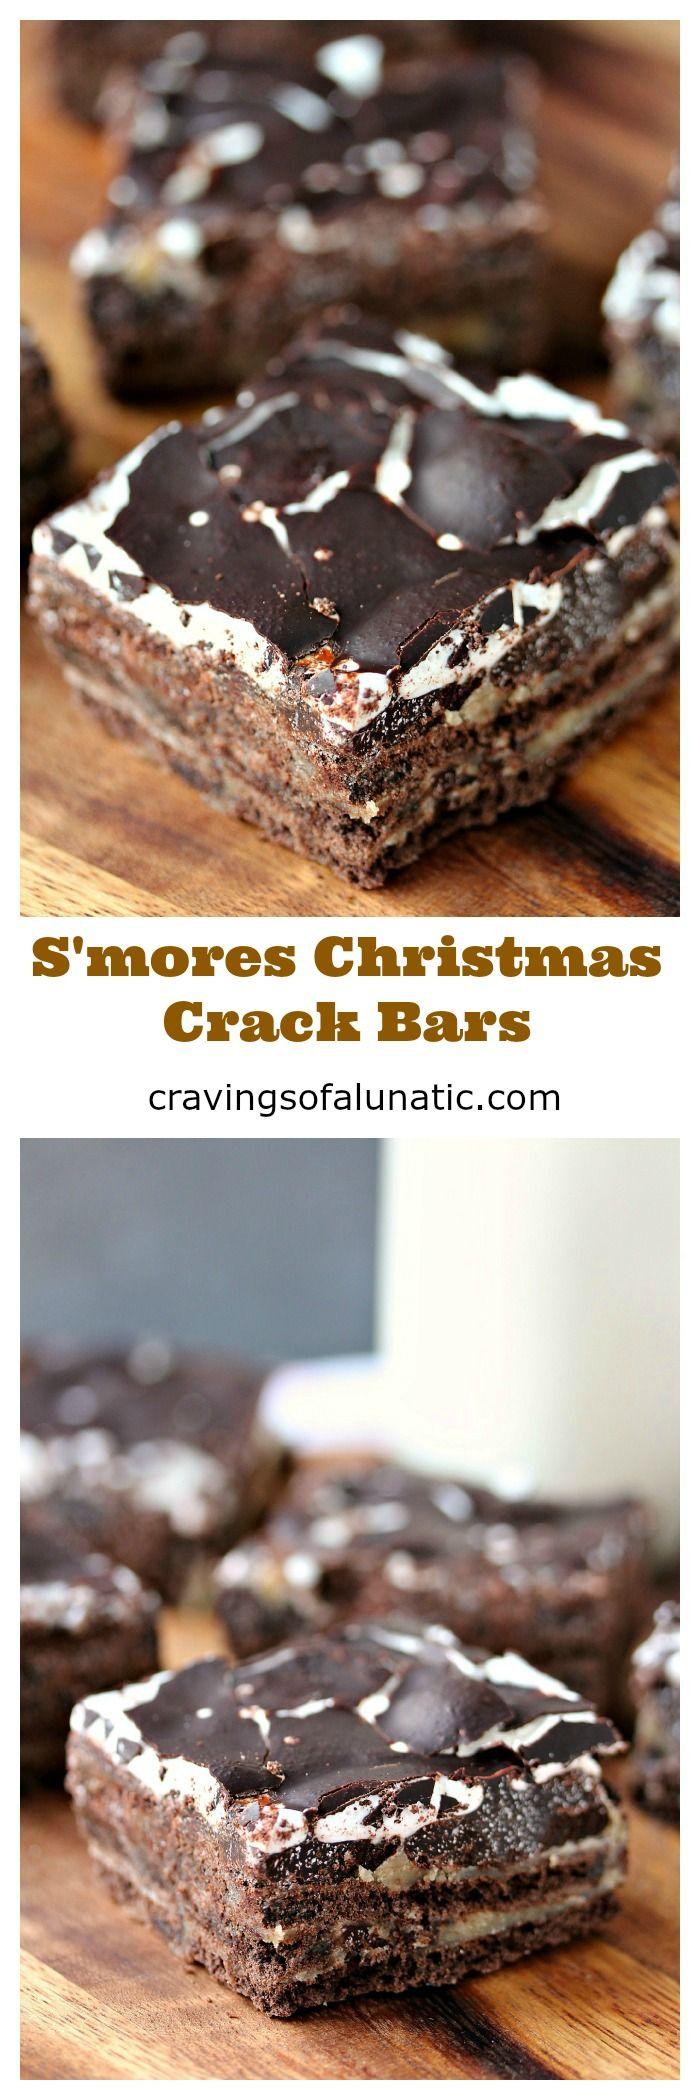 S'mores Christmas Crack Bars